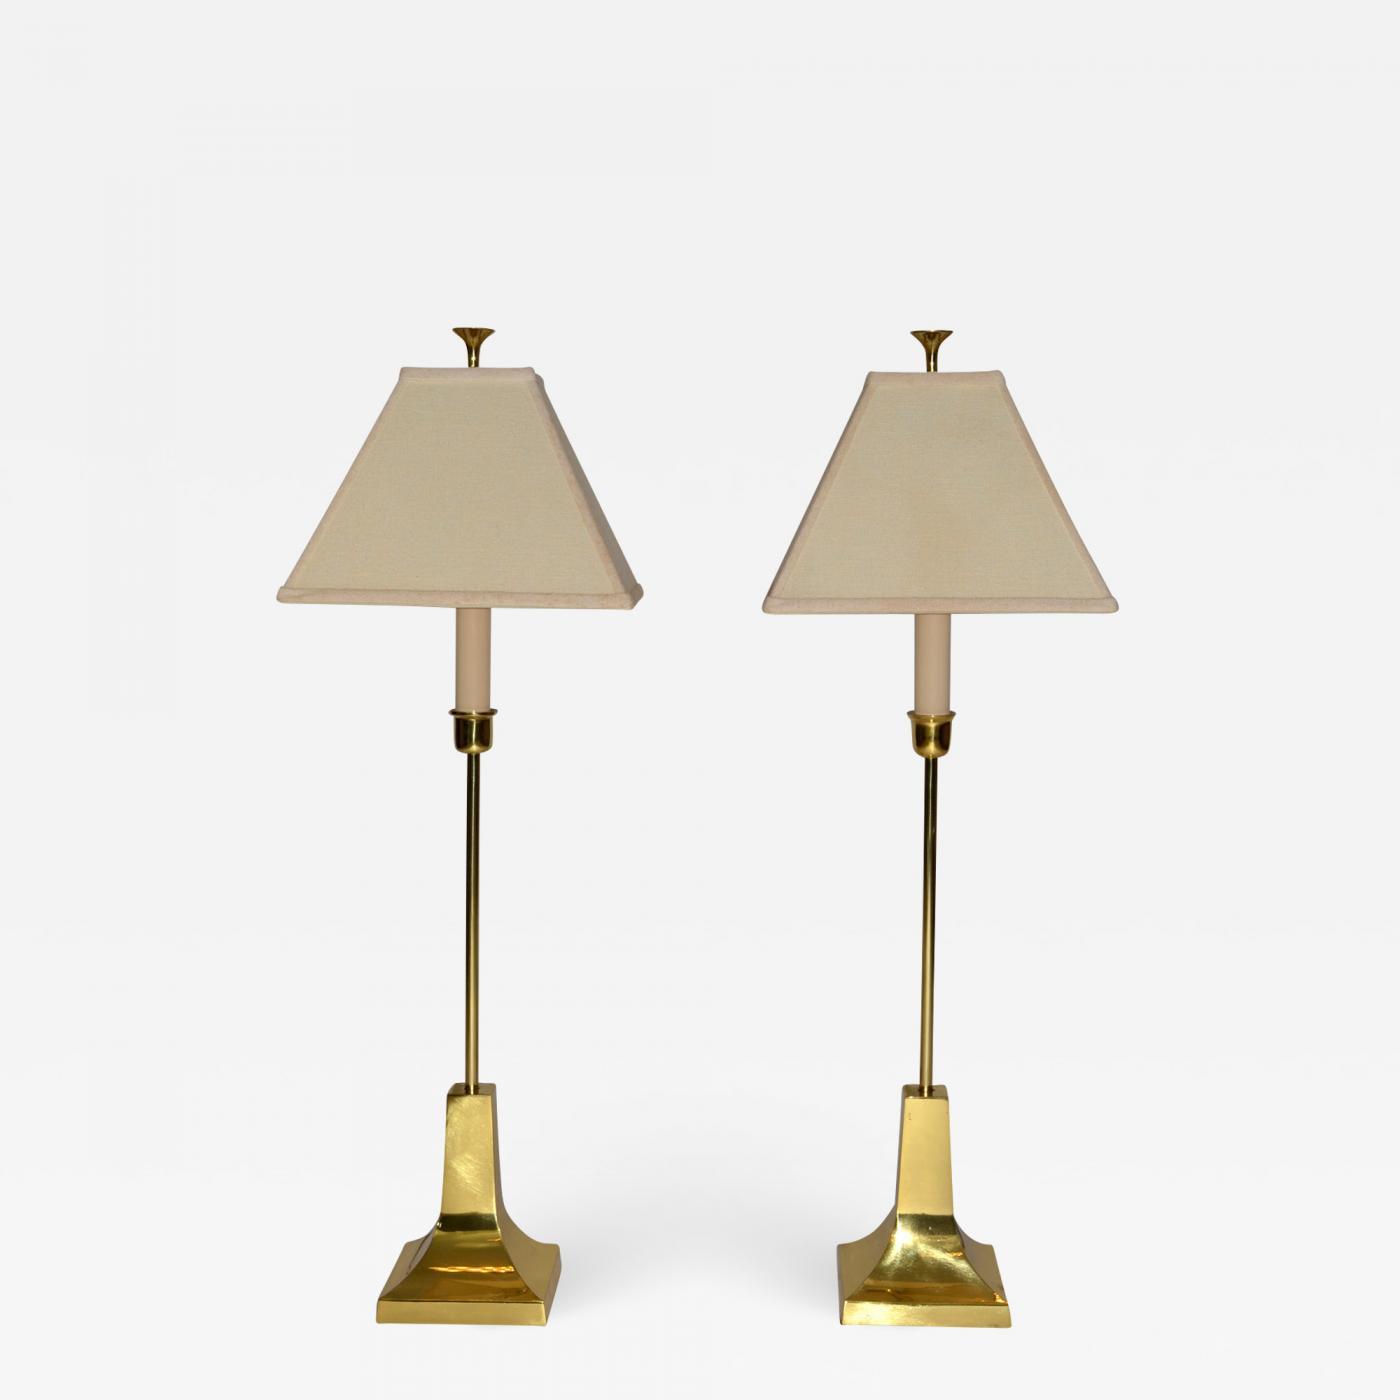 Pair Of Brass Table Lamps By Sarreid Ltd Midcentury Modern 1987